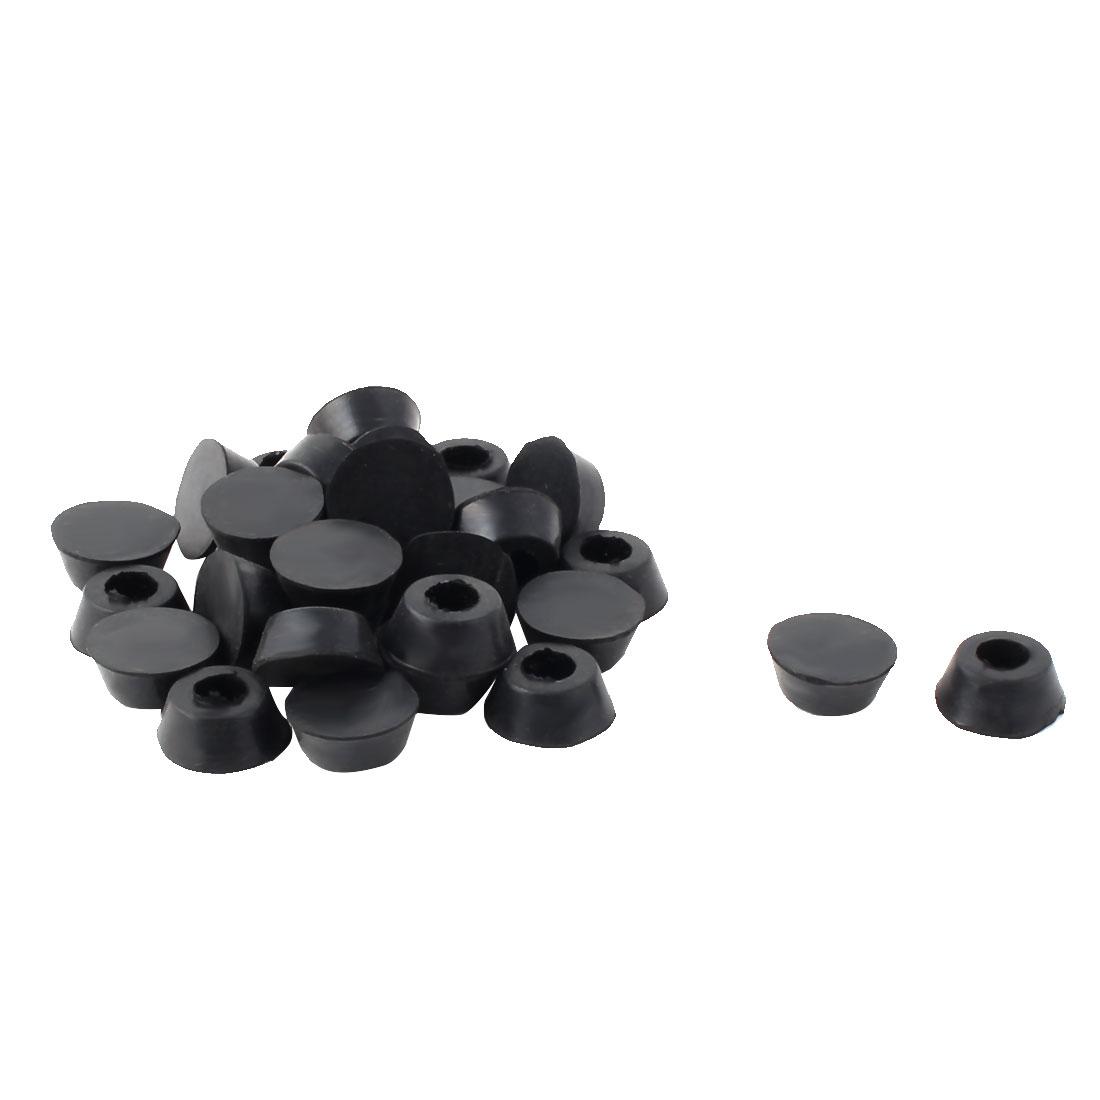 14mm x 18mm x 8mm Amplifier Speaker Instrument Rubber Feet Pad Black 30pcs